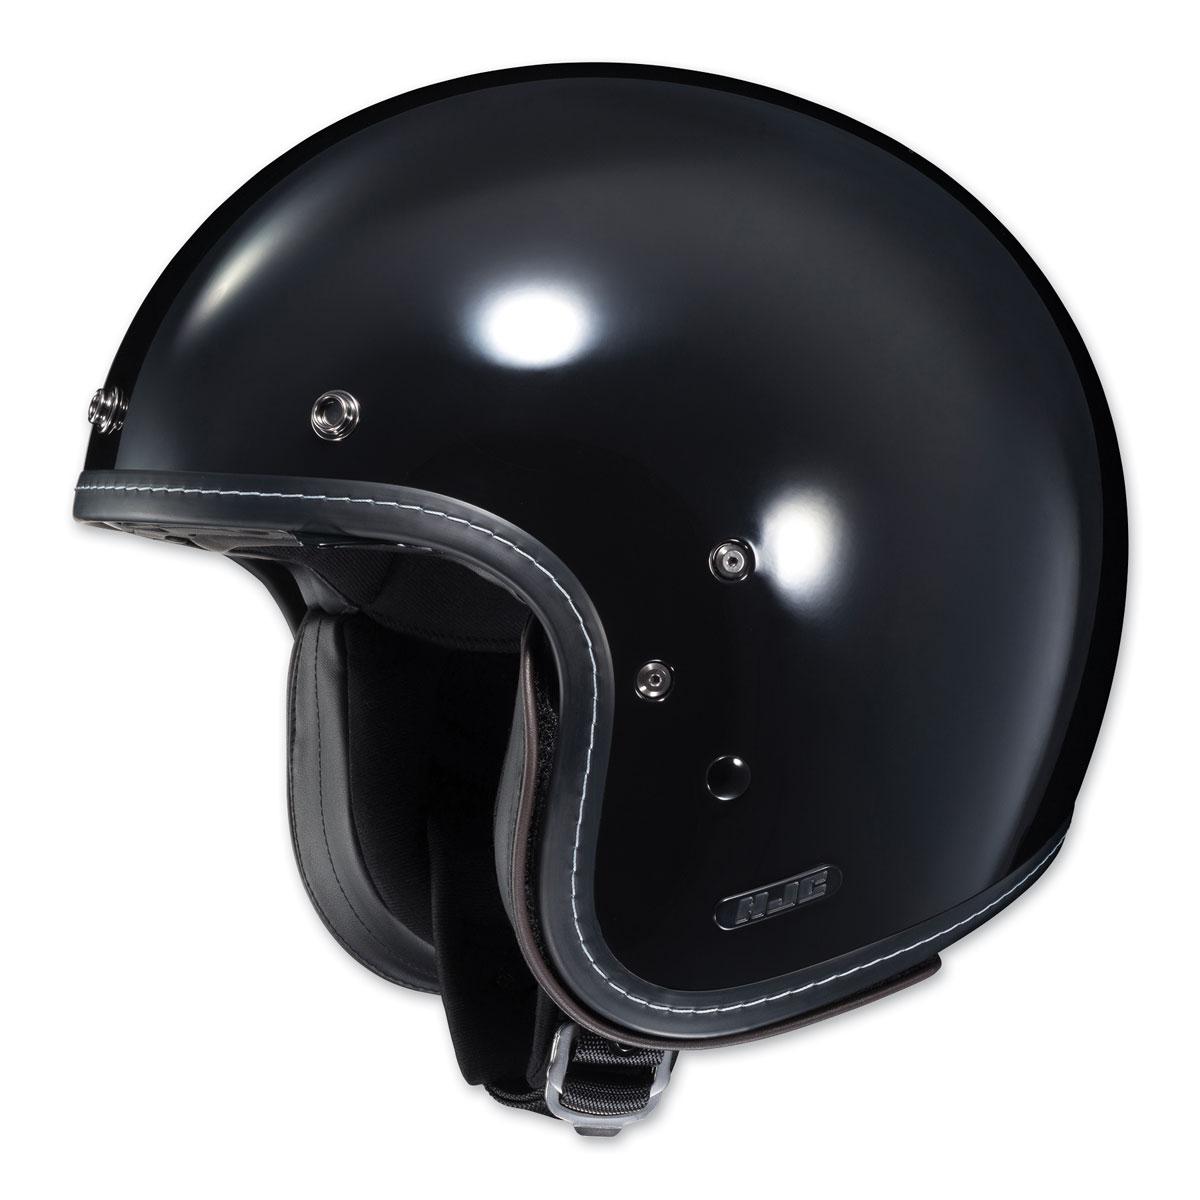 HJC IS-5 Gloss Black Open Face Helmet